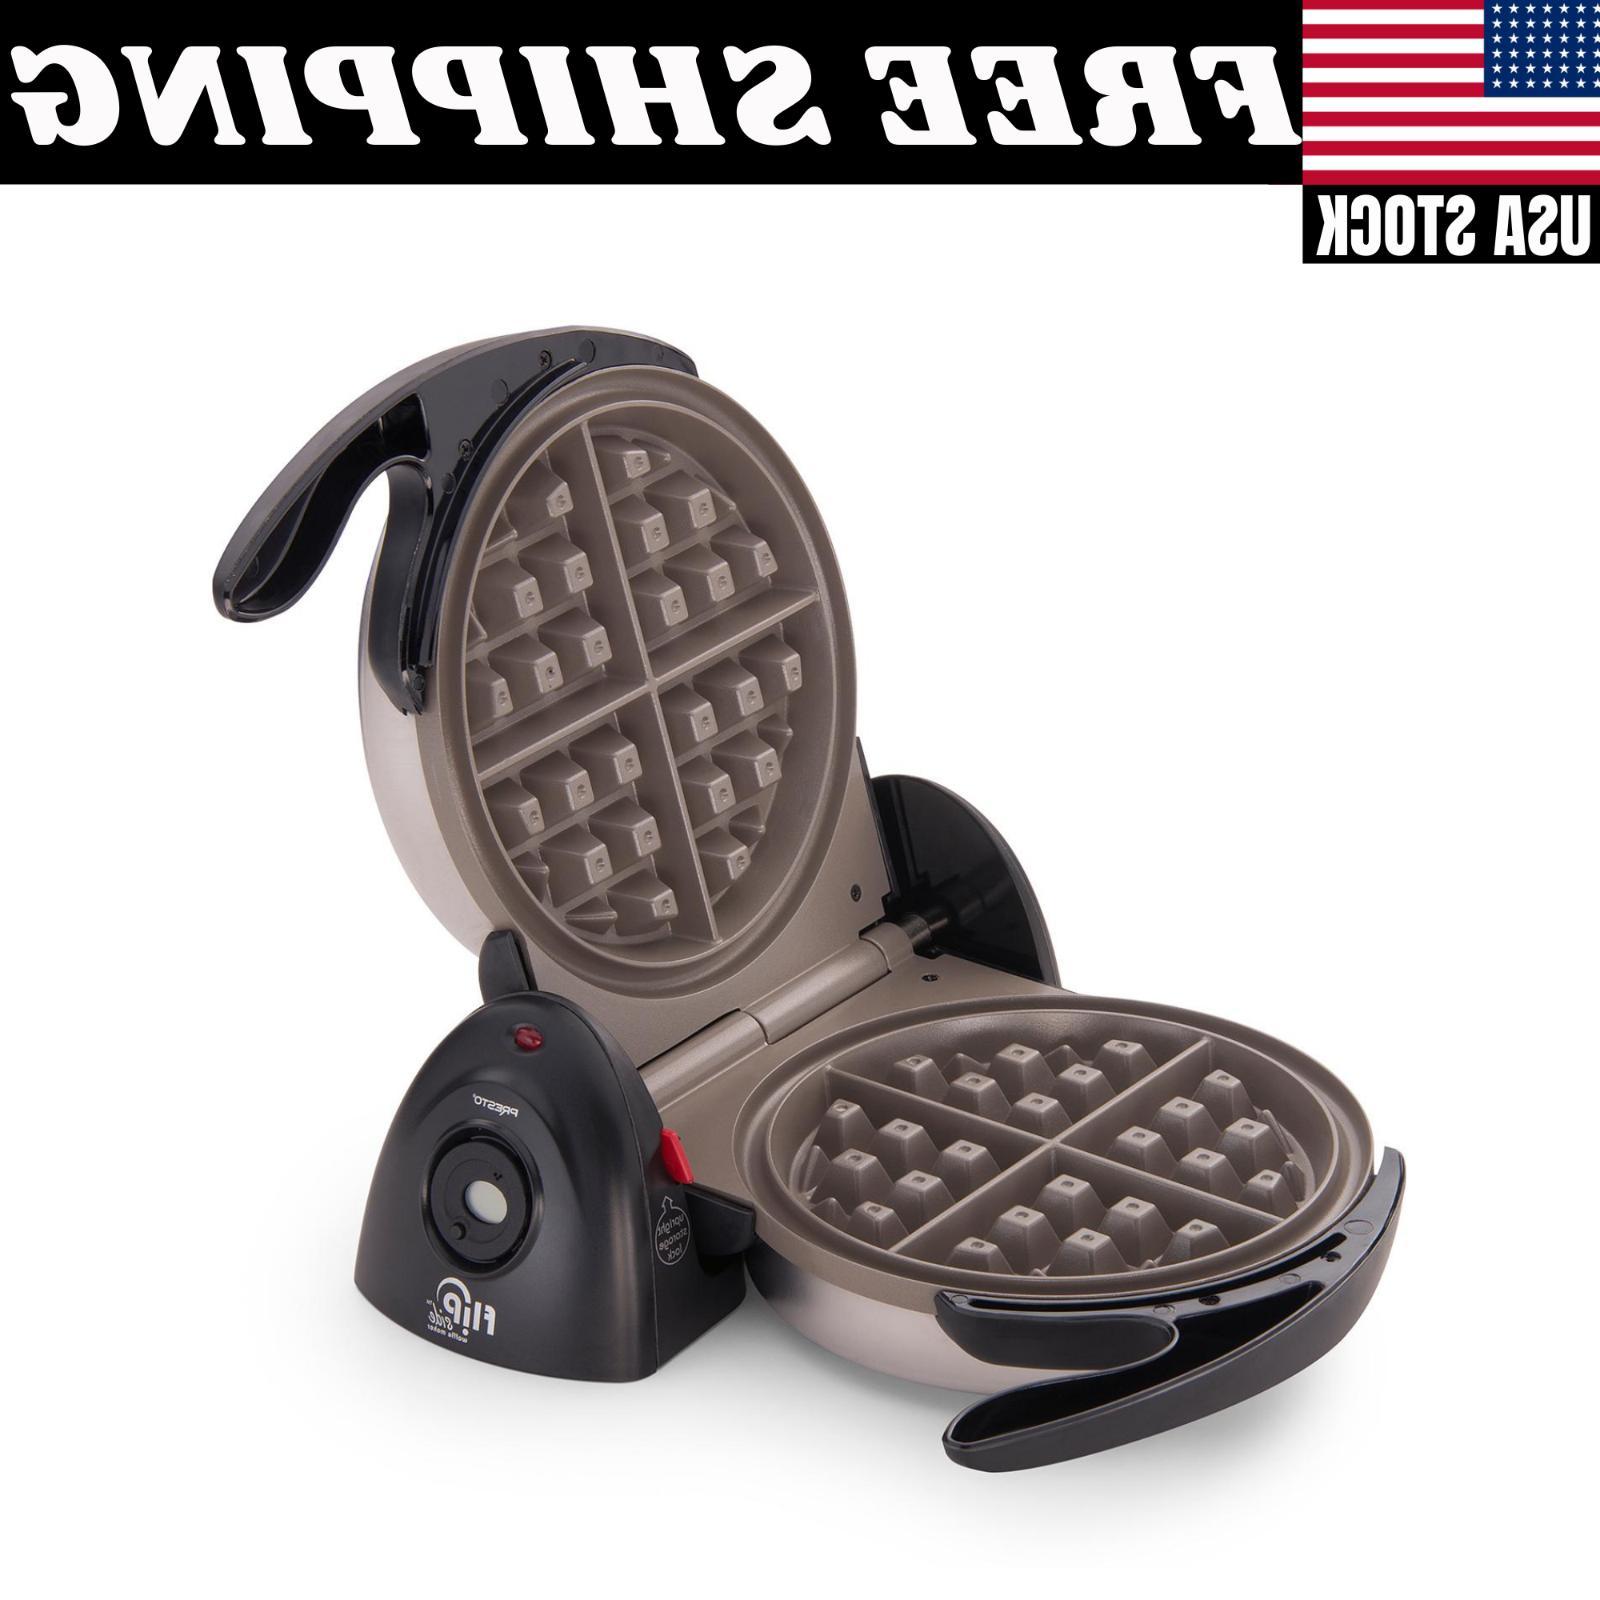 flipside belgian waffle maker home kitchen ceramic